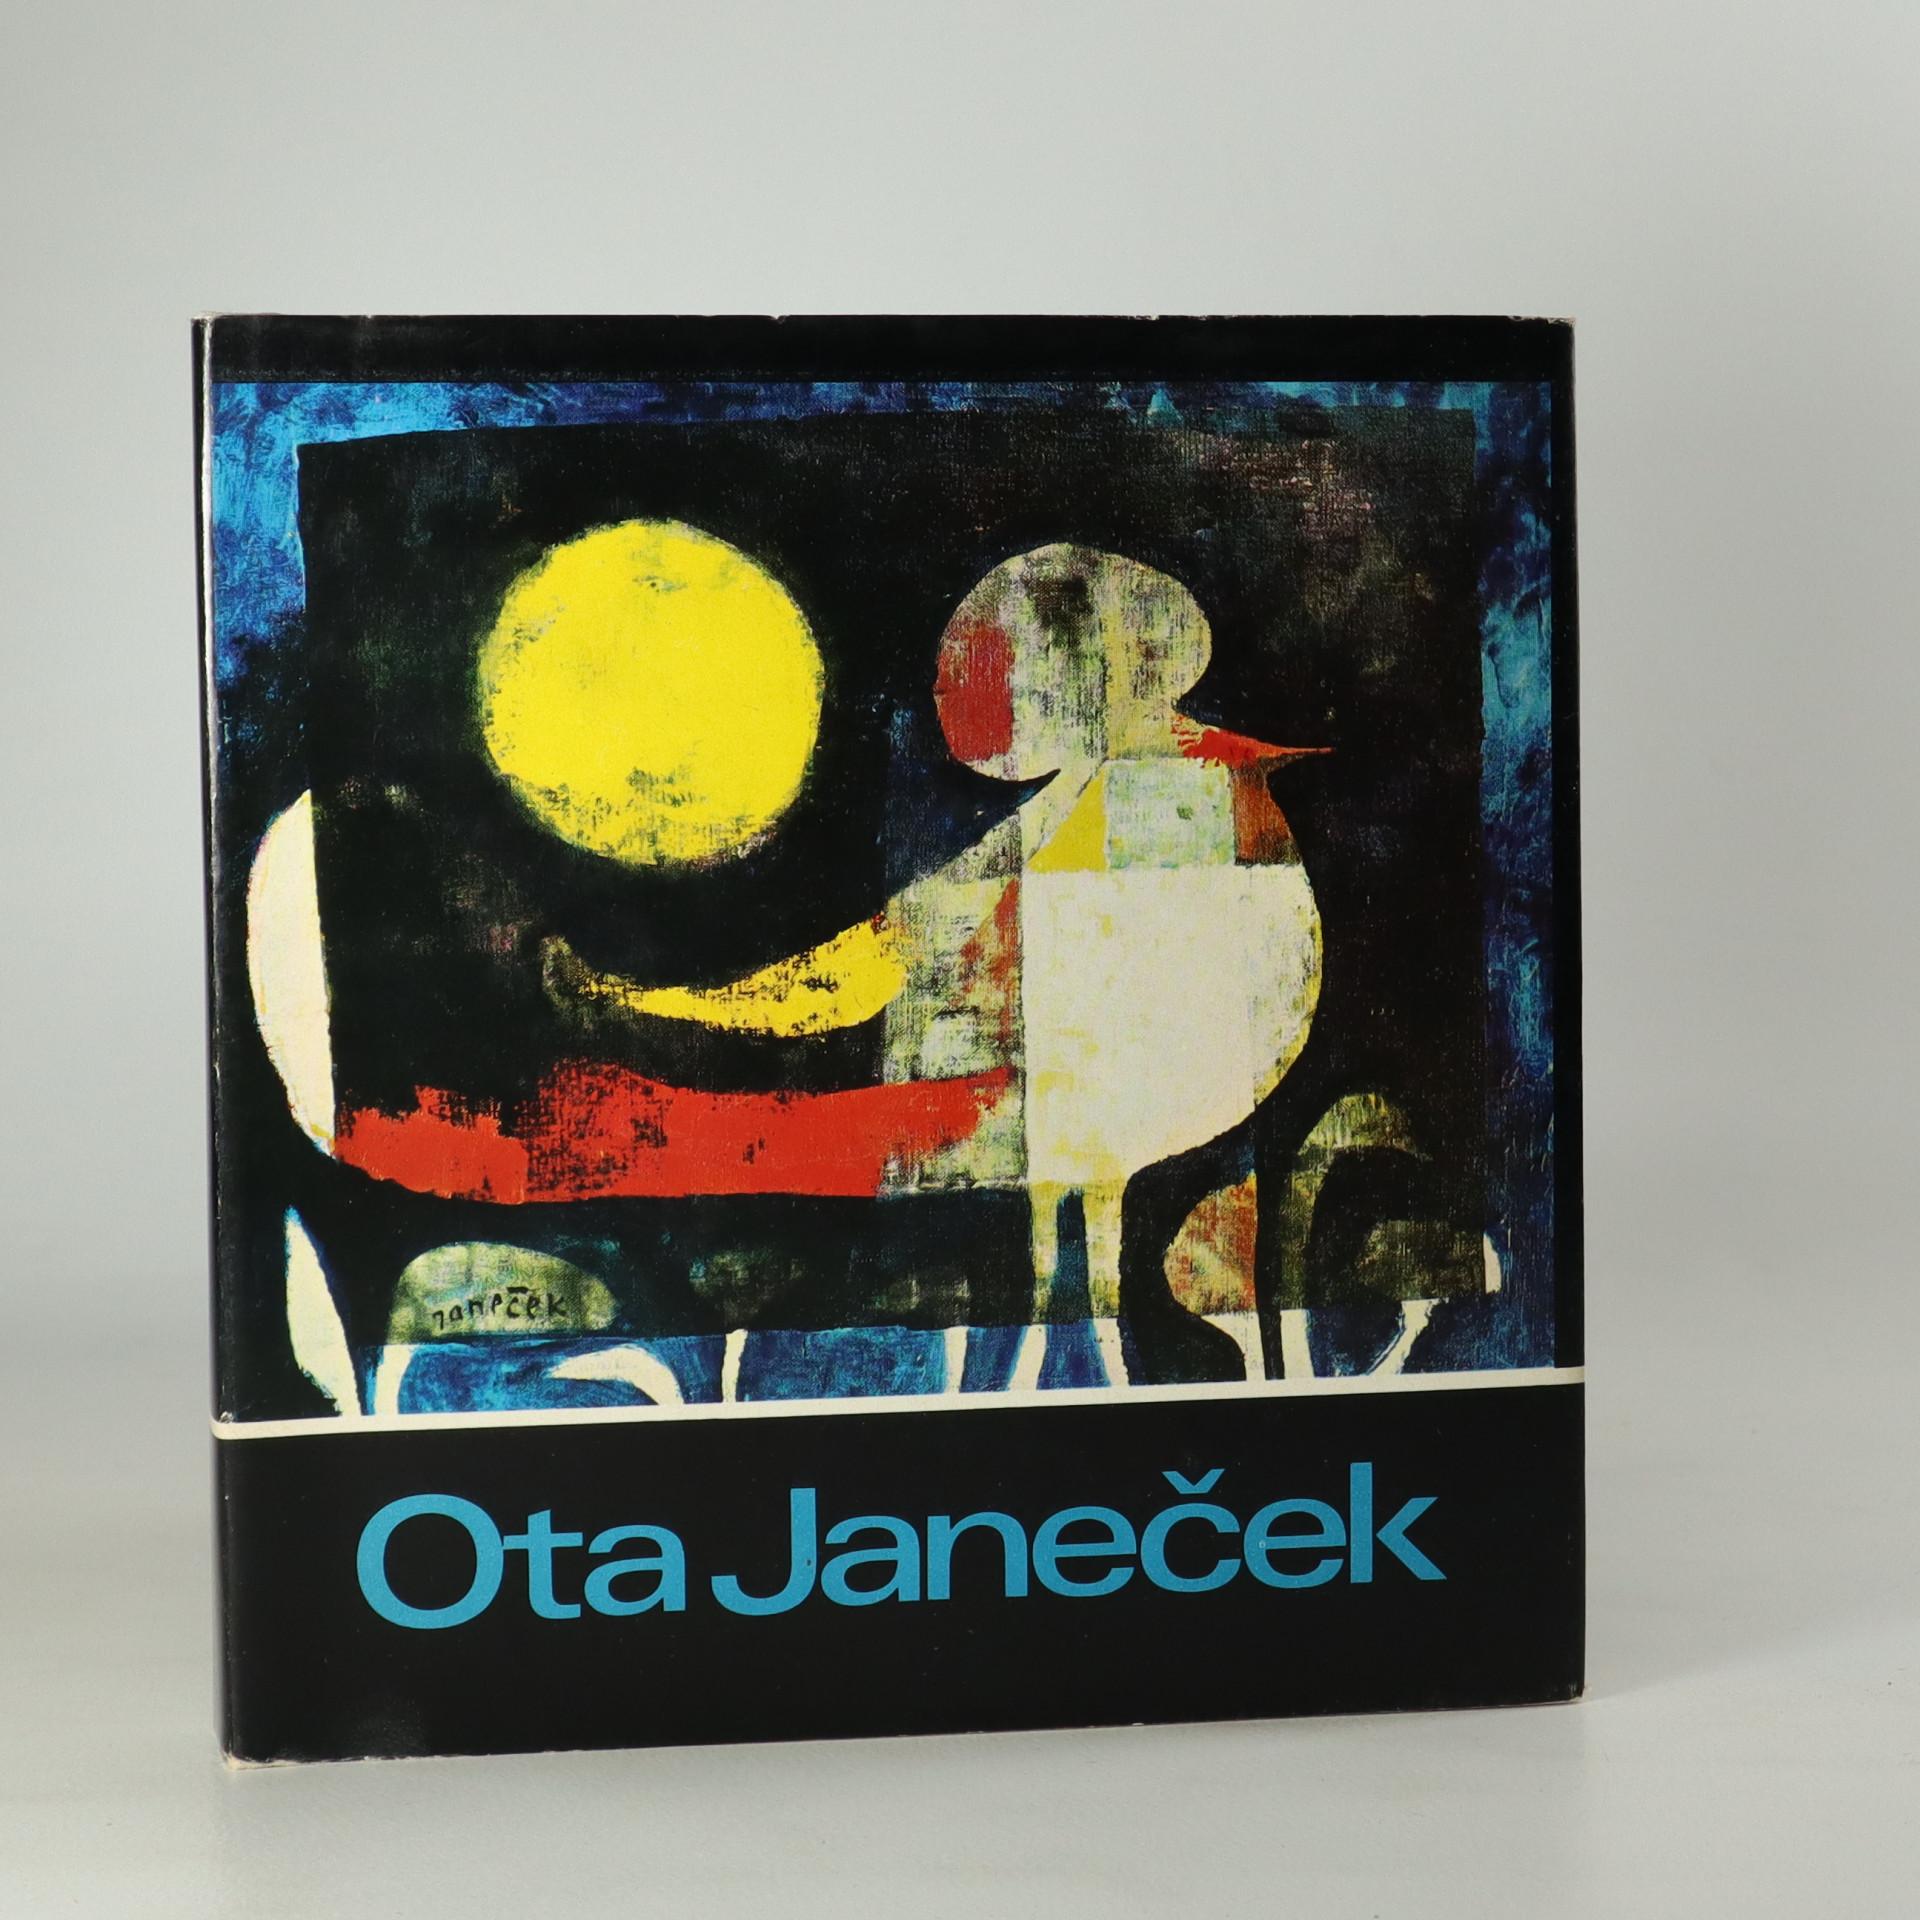 antikvární kniha Ota Janeček, 1973